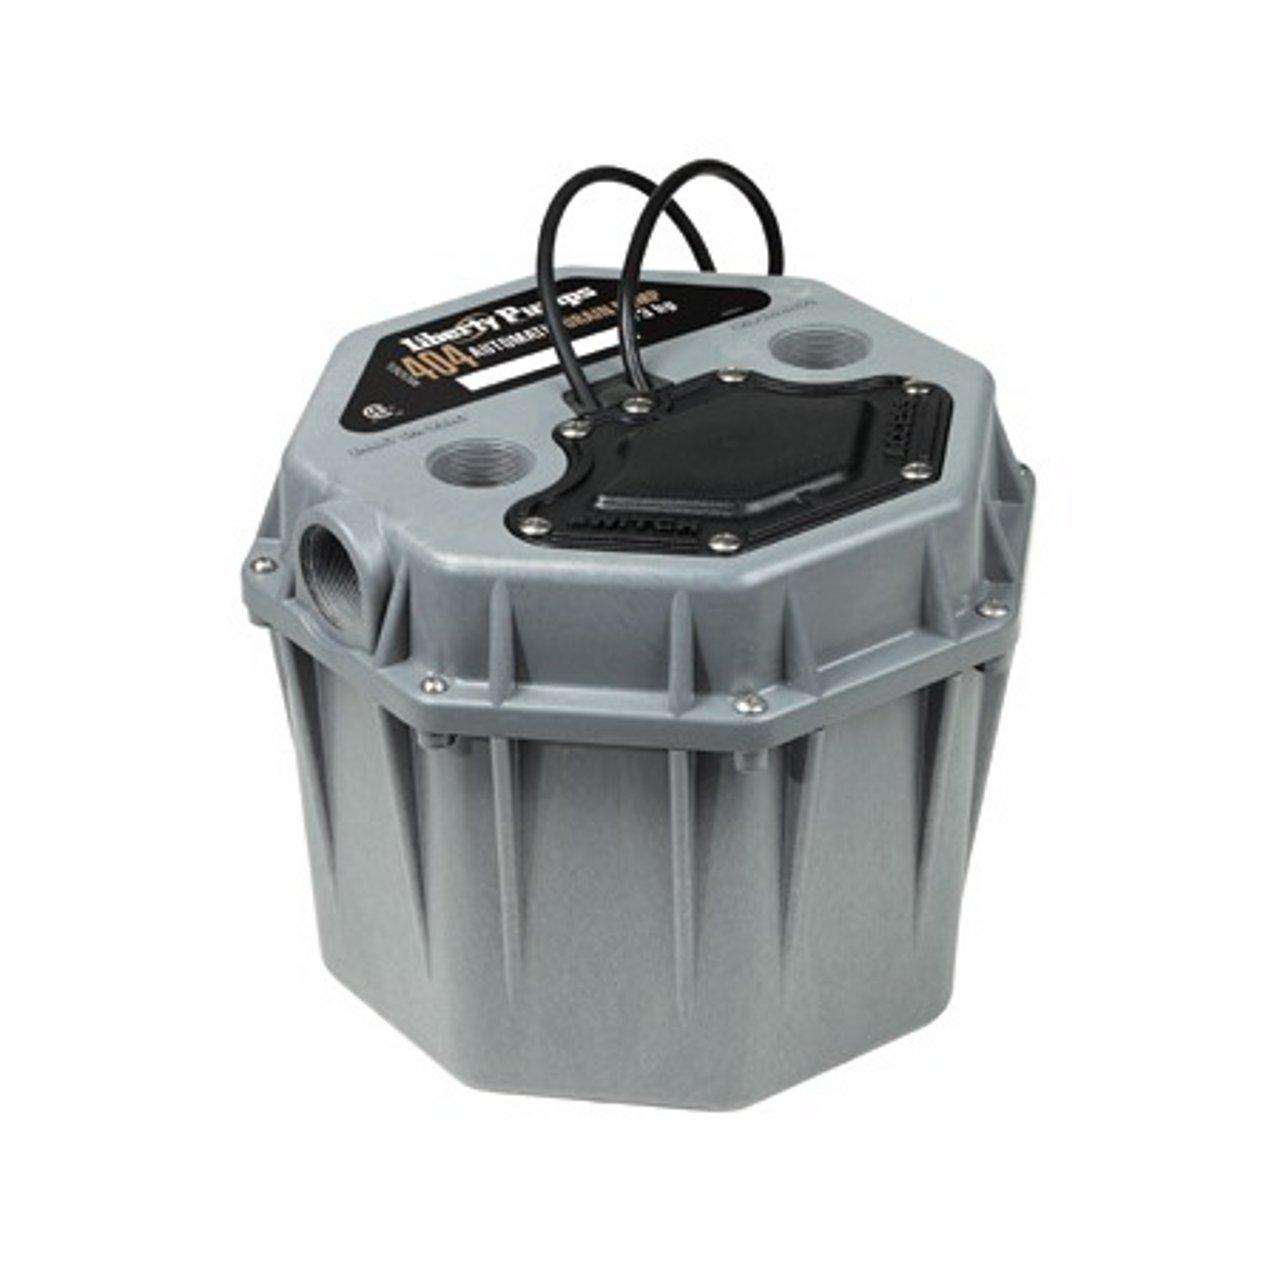 Liberty Pumps 404 1/3 HP, 115V Residential Drain Pump